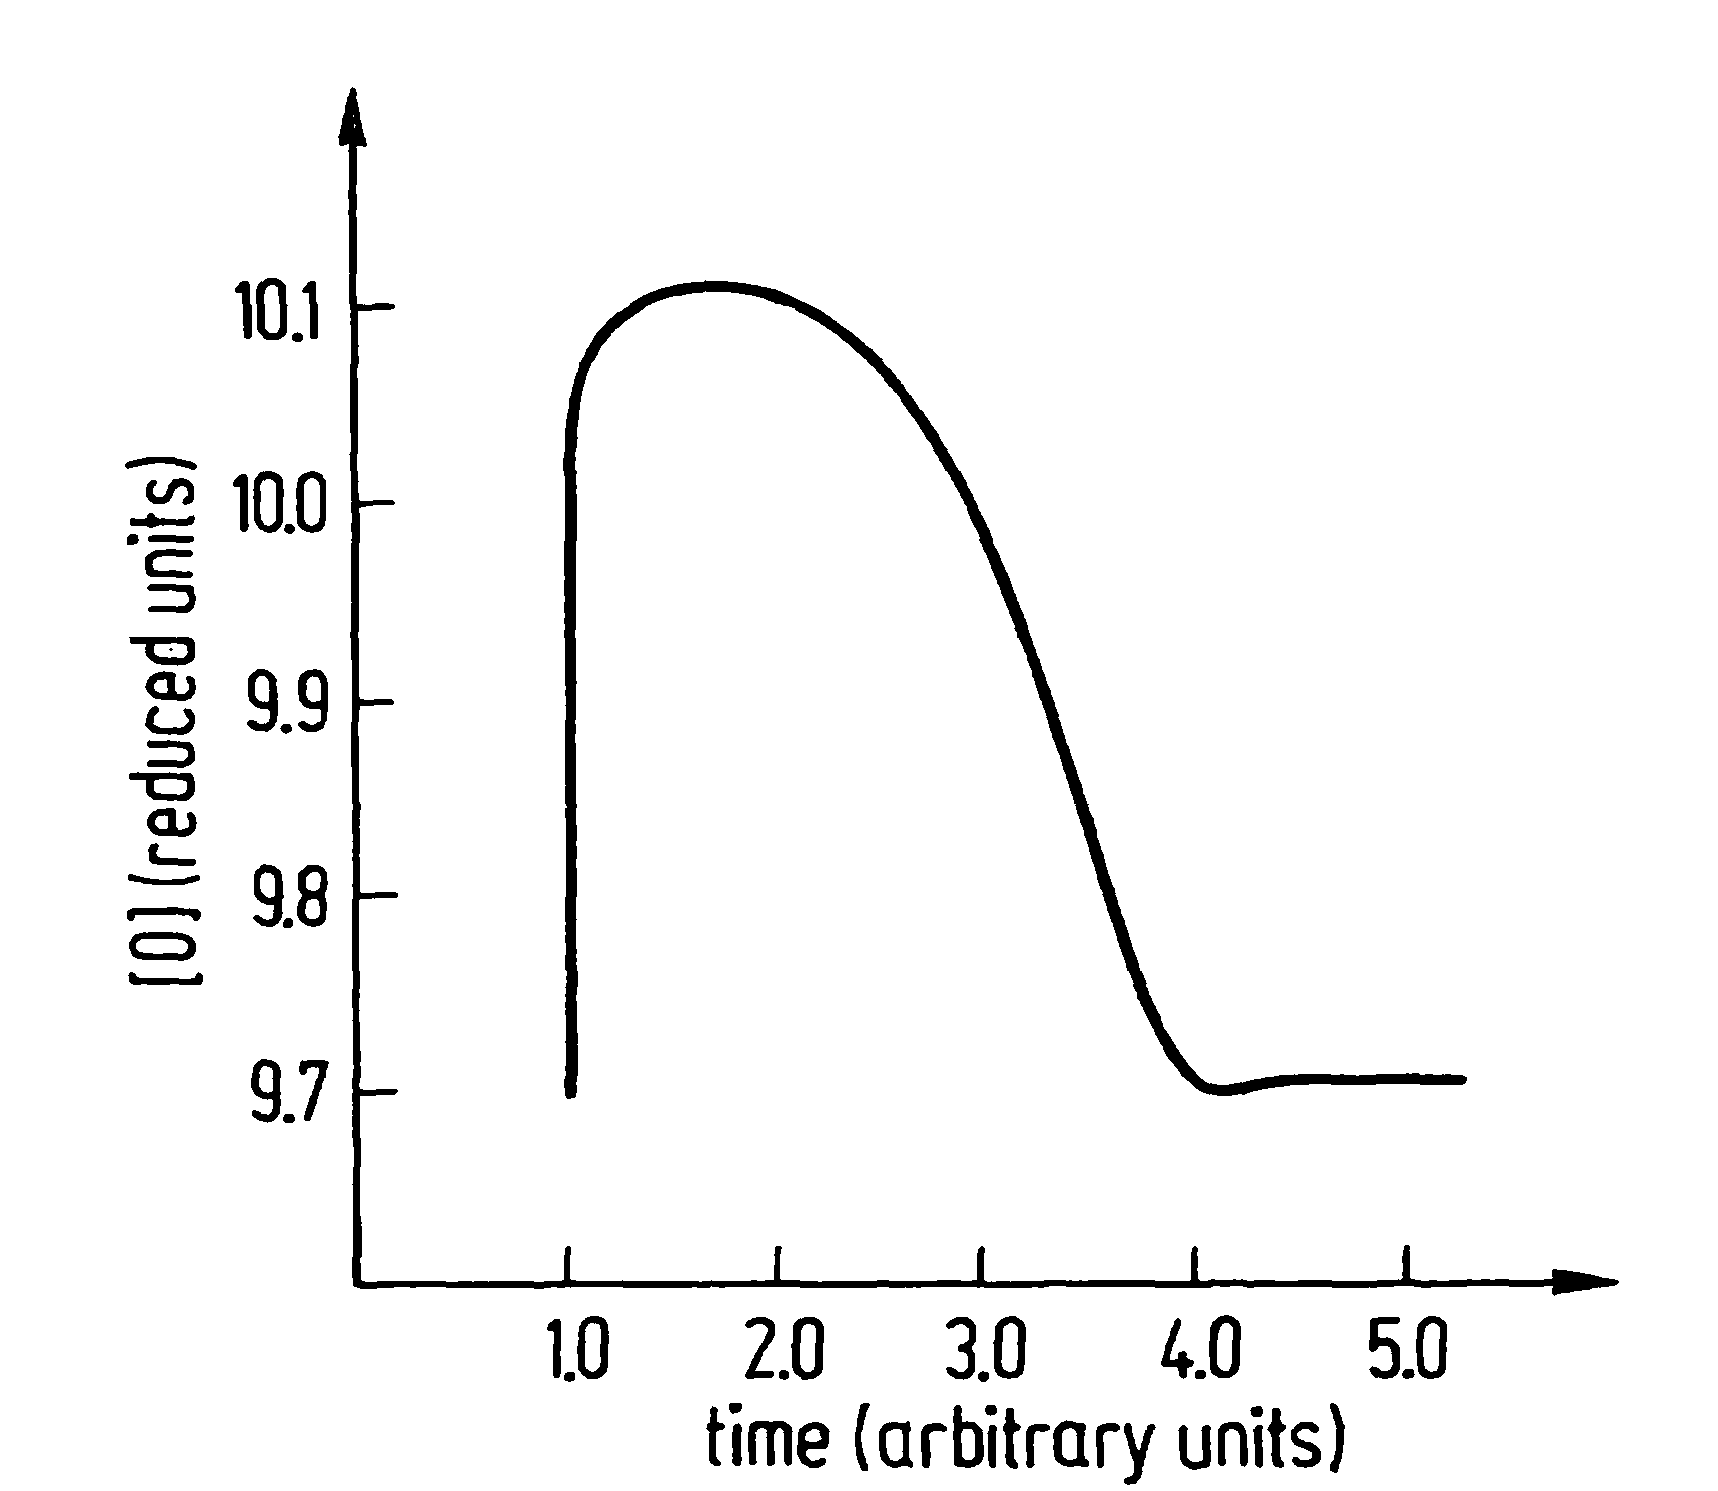 Nonequilibrium Phenomena in the Kinetics of Photochemical Ozone Production   John J. Kozak, G. Nicolis, J. W. Kress and M. Sanglier, J. Non-Equilib. Thermodyn. 4, 67-74 (1979)